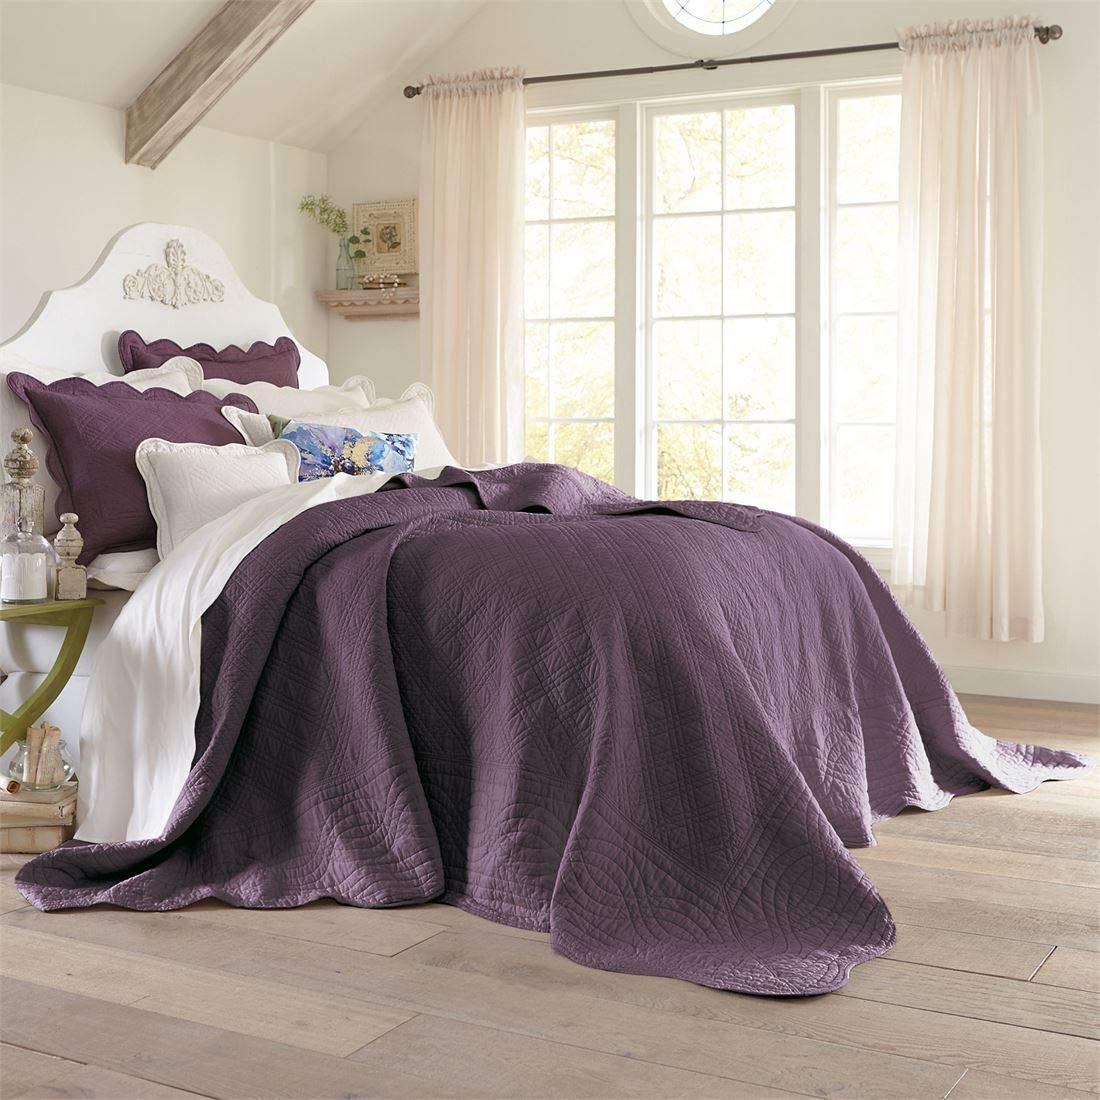 BrylaneHome Florence Bedspread (Plum,King)